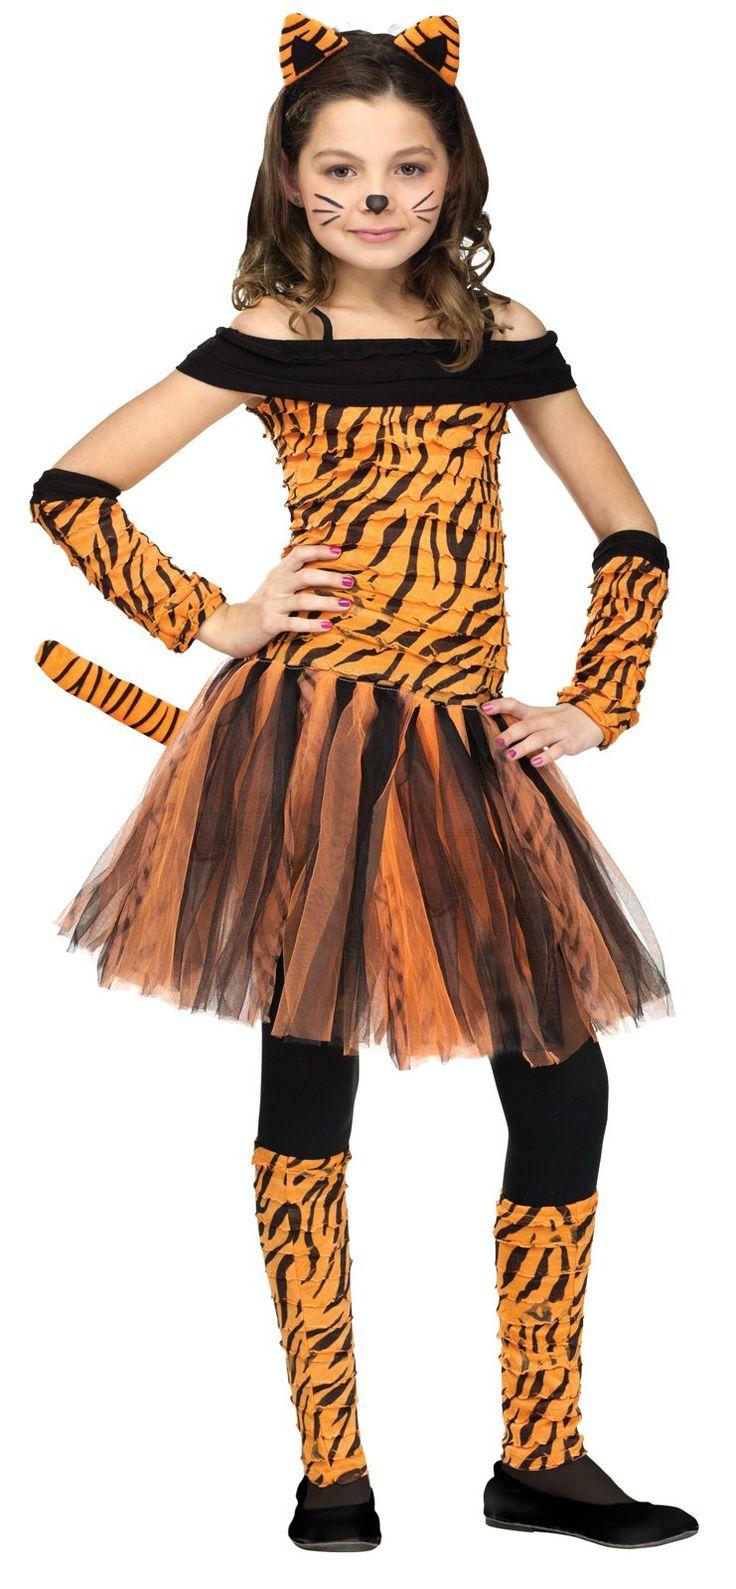 Best 25+ Tiger costume ideas on Pinterest | Makeup jobs, Lion ...